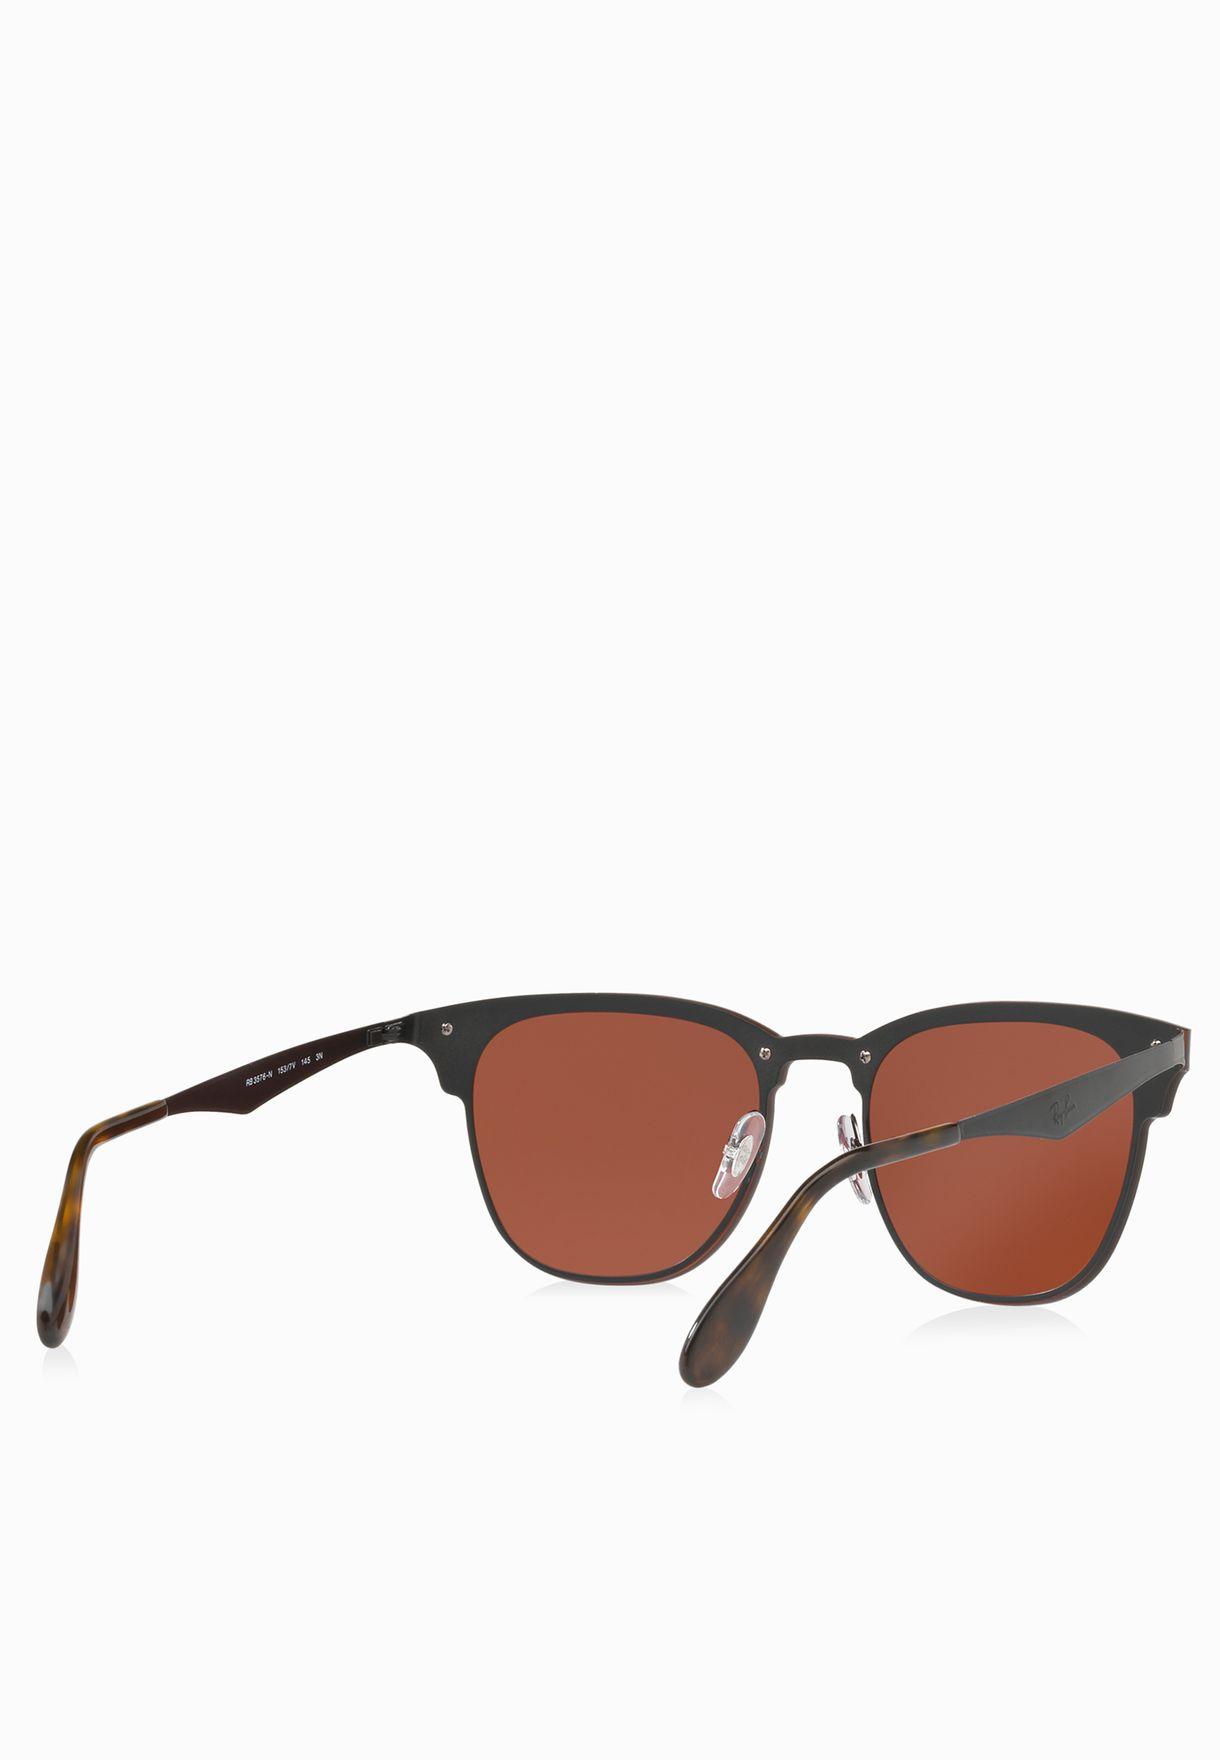 0RB3576N Casual Sunglasses